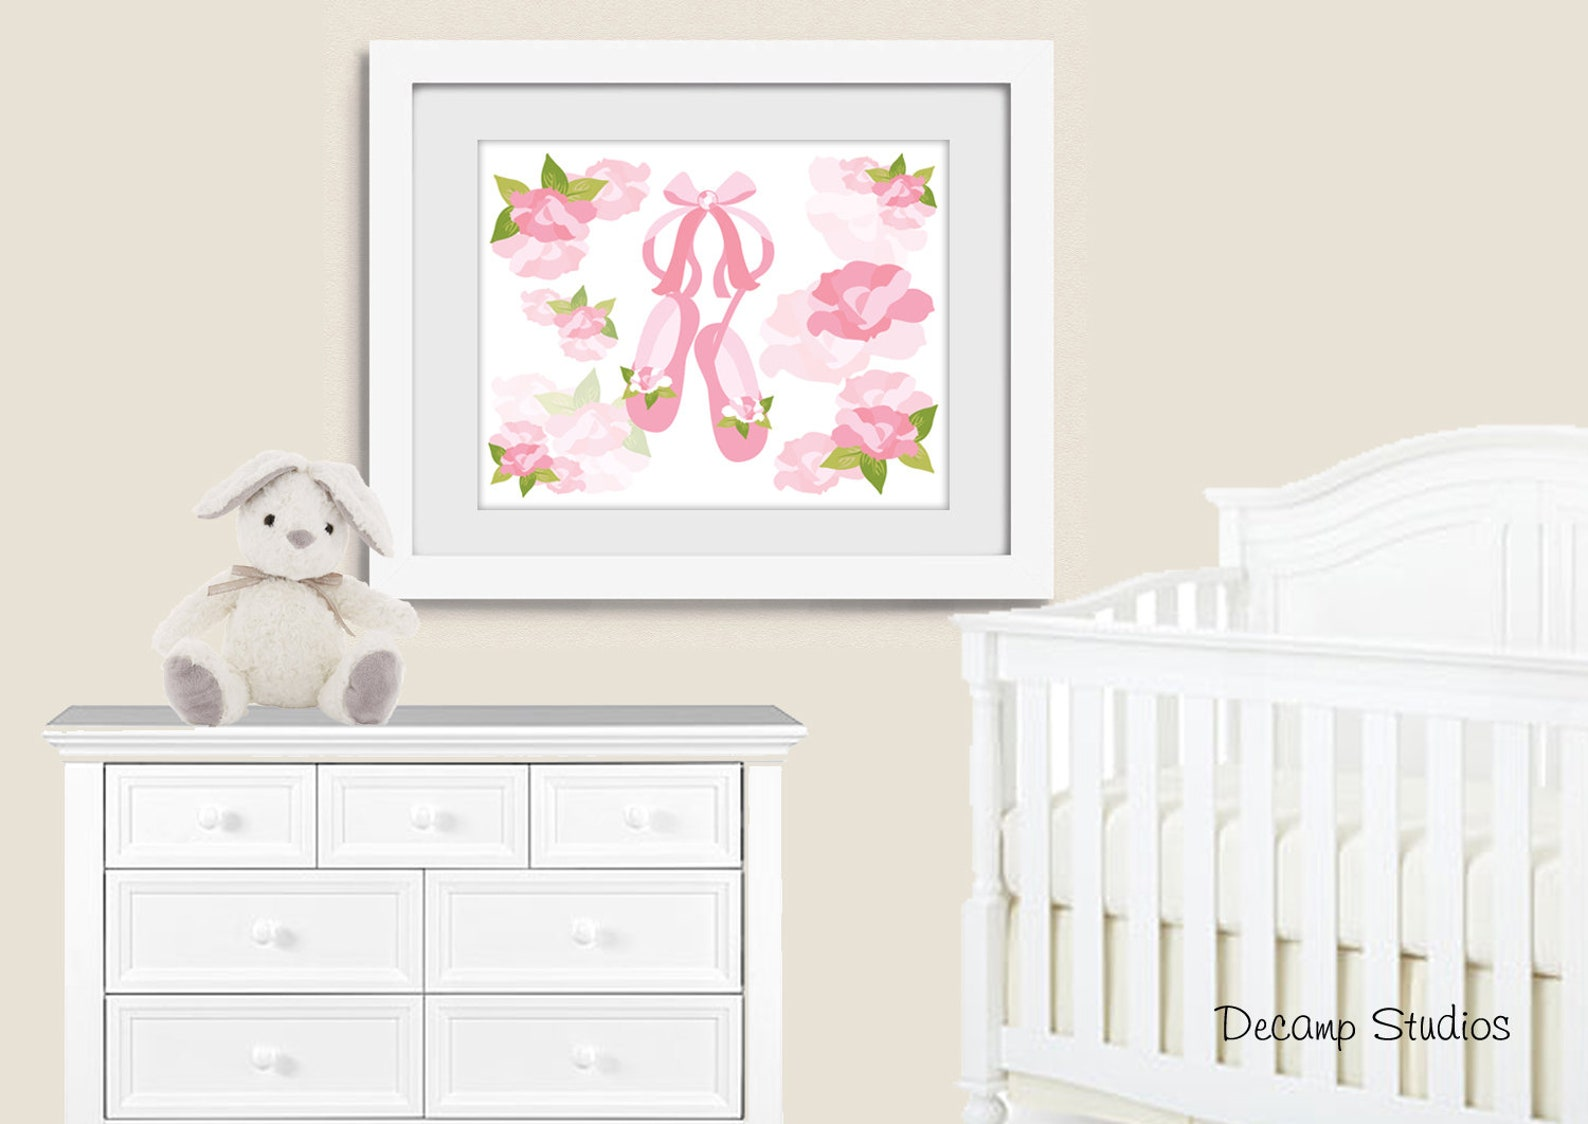 printable ballerina nursery girl wall art princess digital download baby pink floral roses tiara crown cupcake ballet shoes tutu